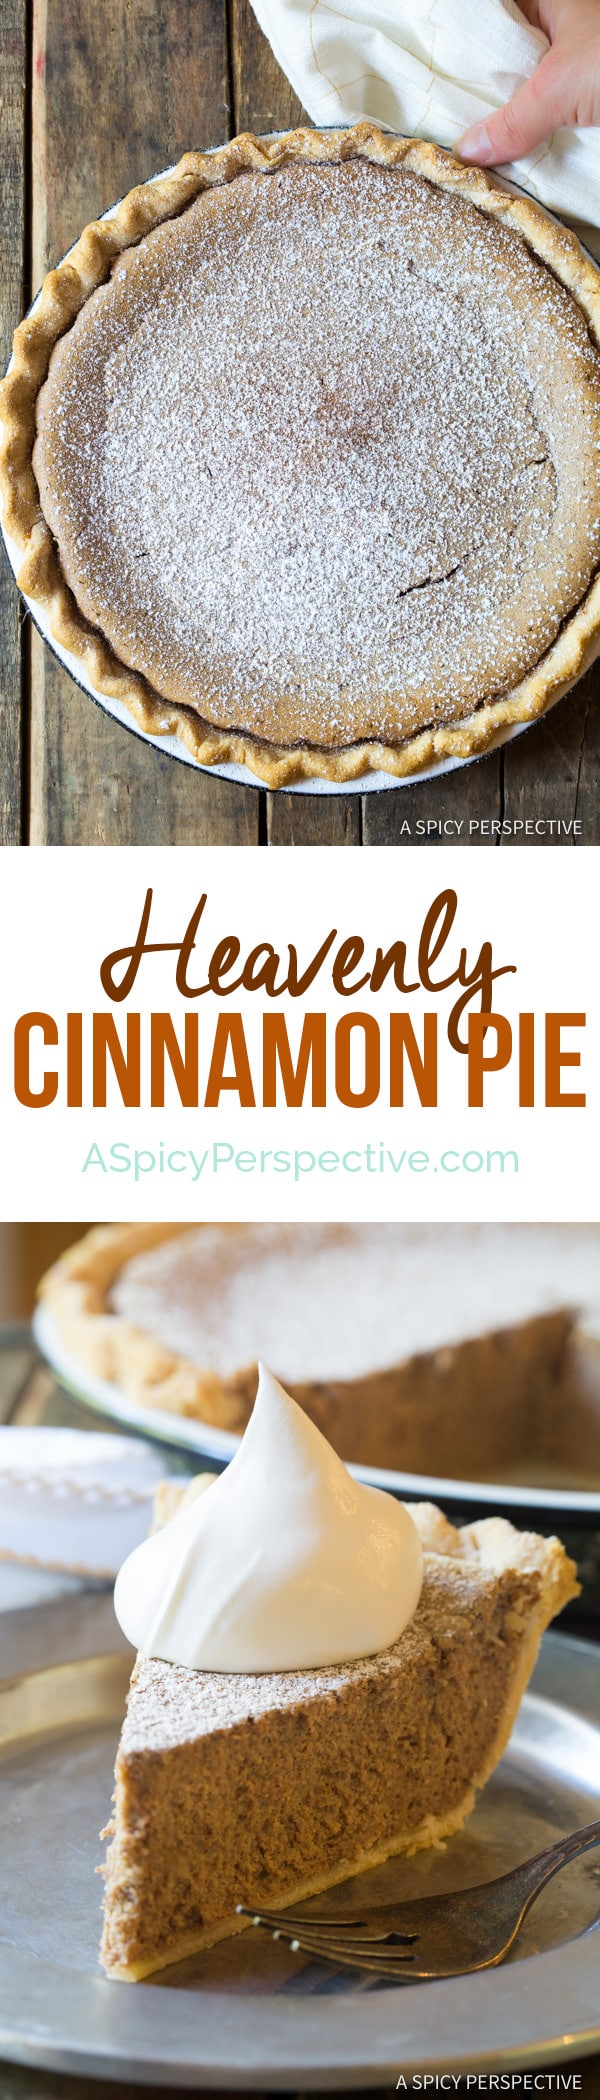 The Perfect Cinnamon Pie Recipe | ASpicyPerspective.com